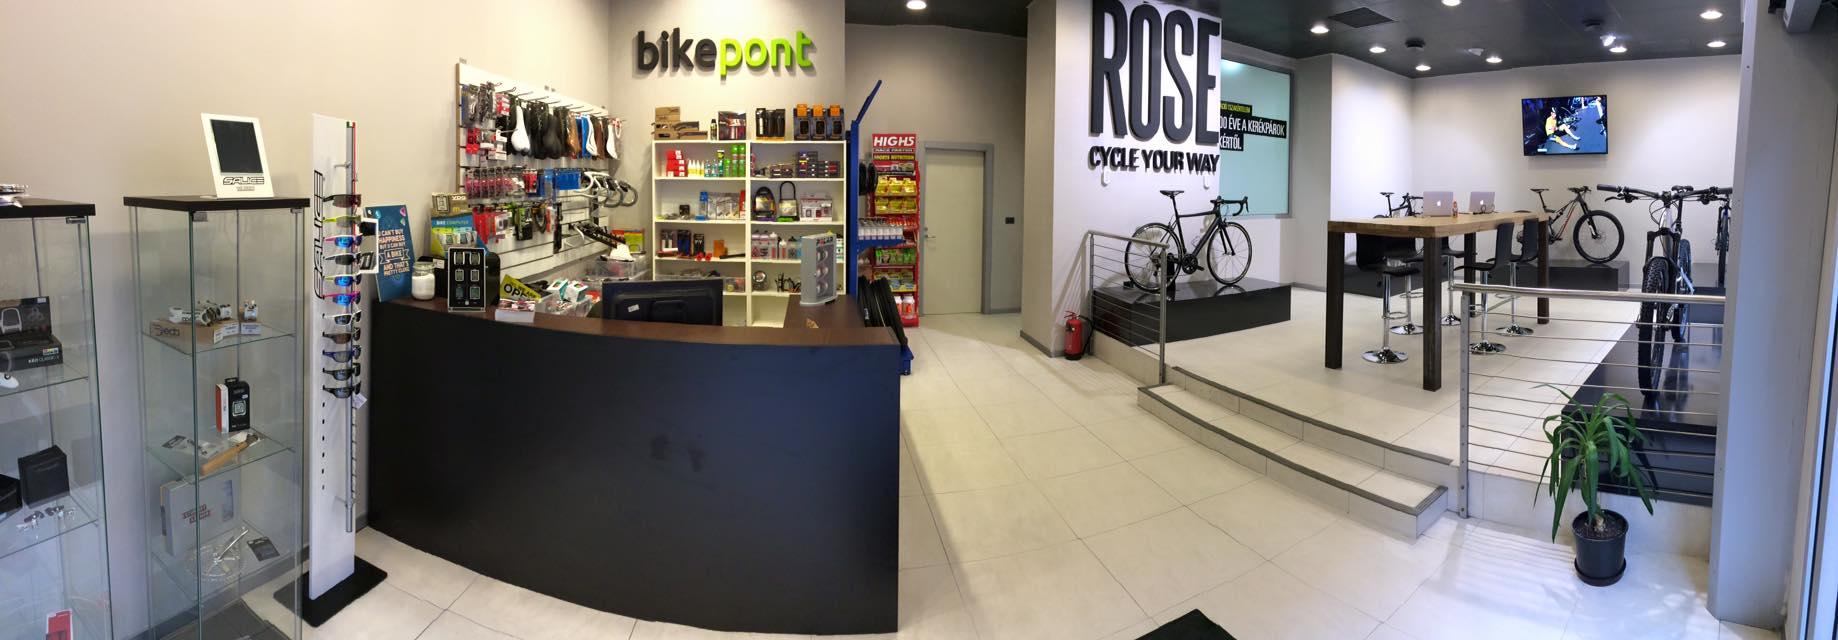 ROSE bringák a Bikepont-ban!